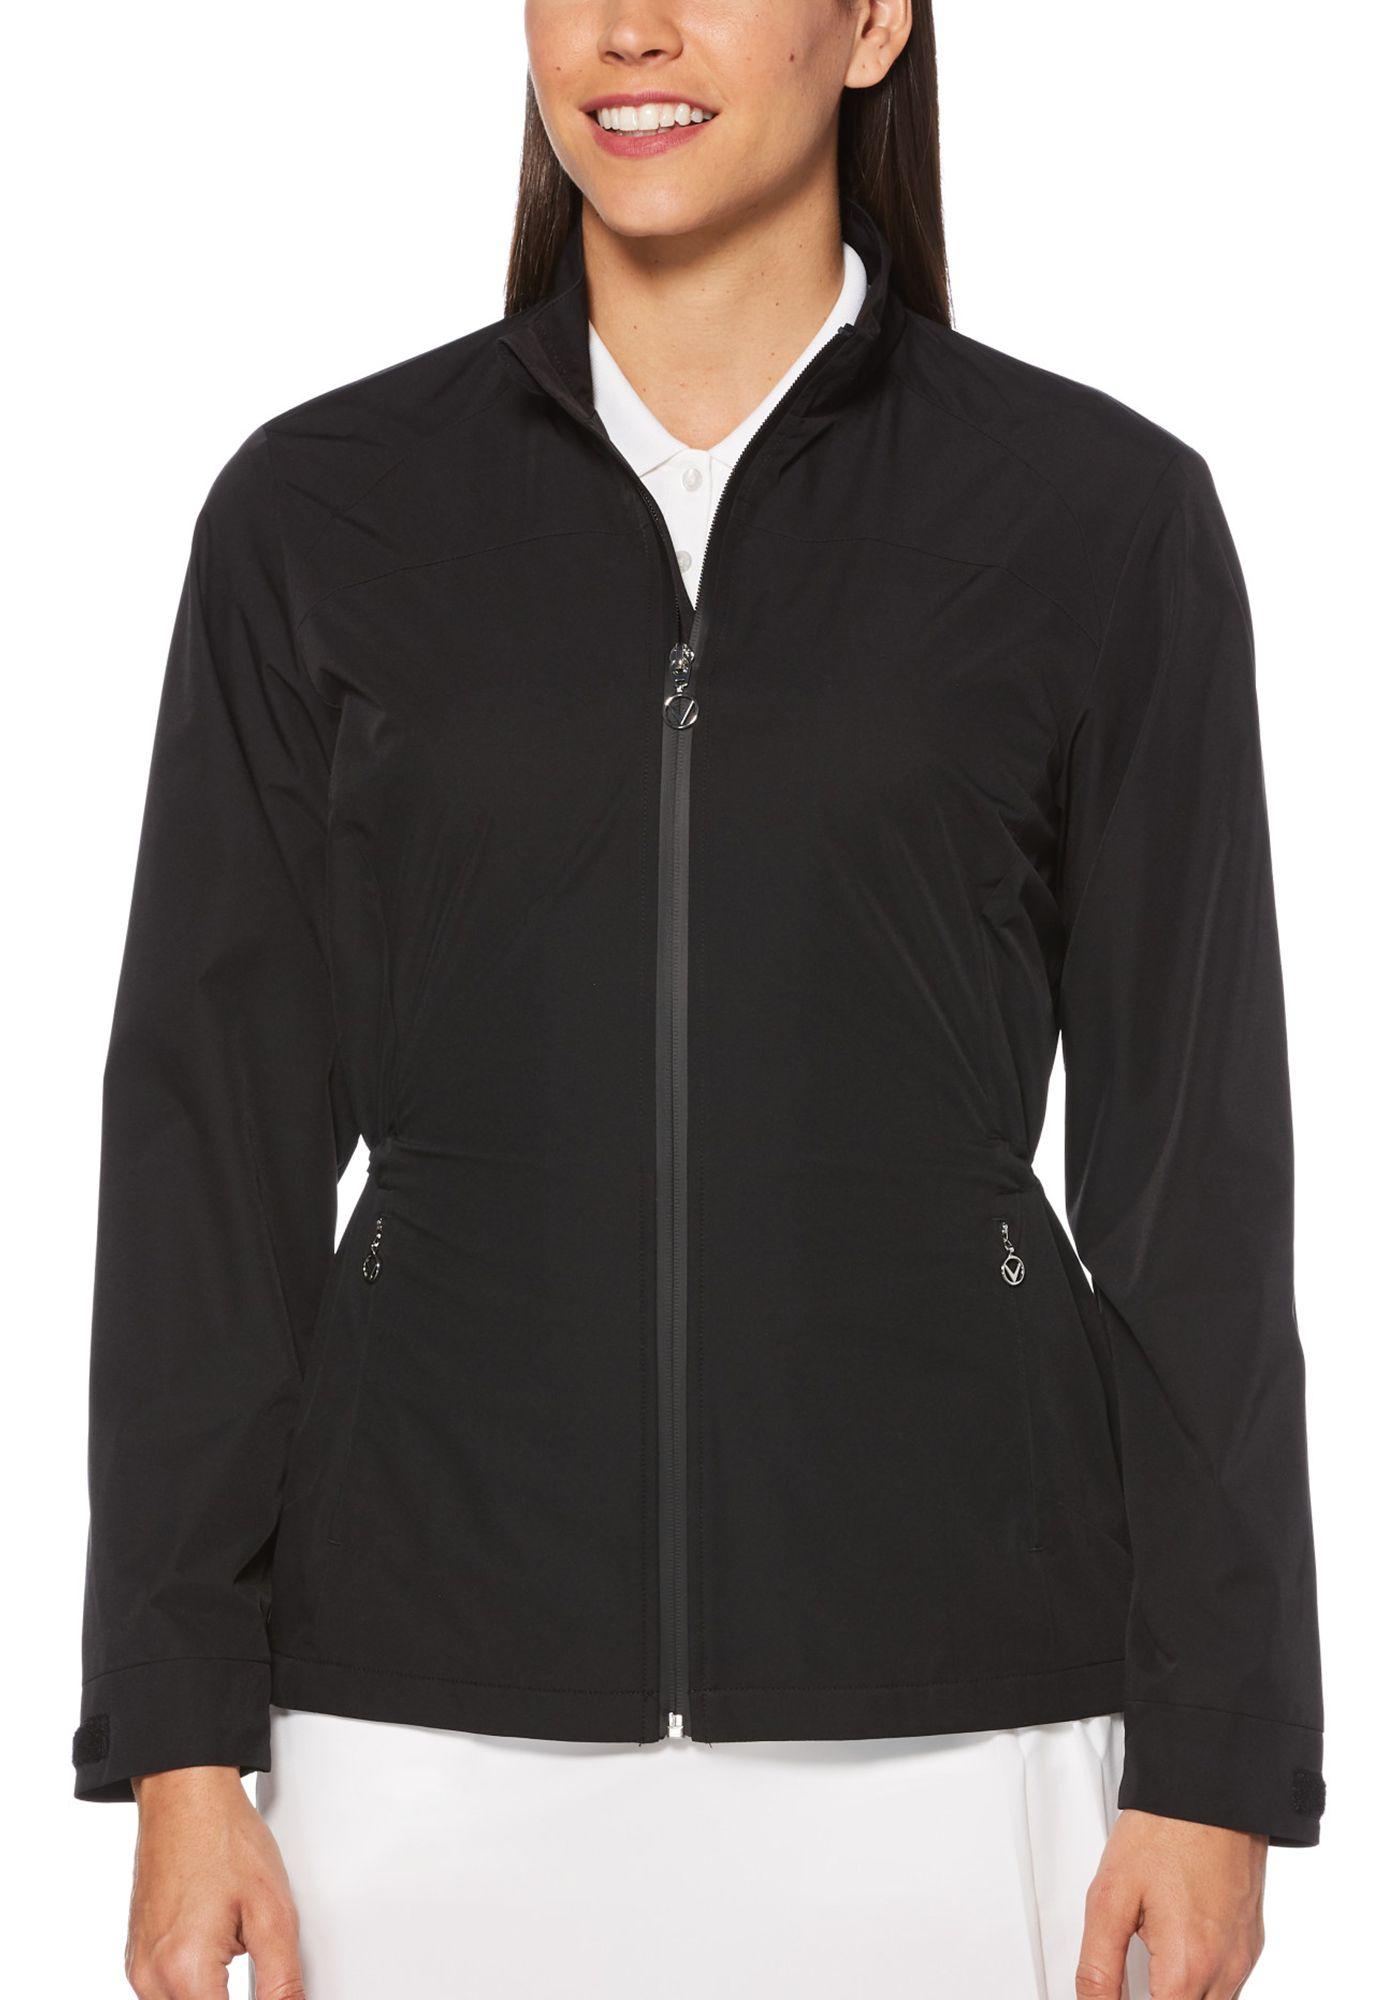 Callaway Women's Windwear Full Zip Golf Jacket